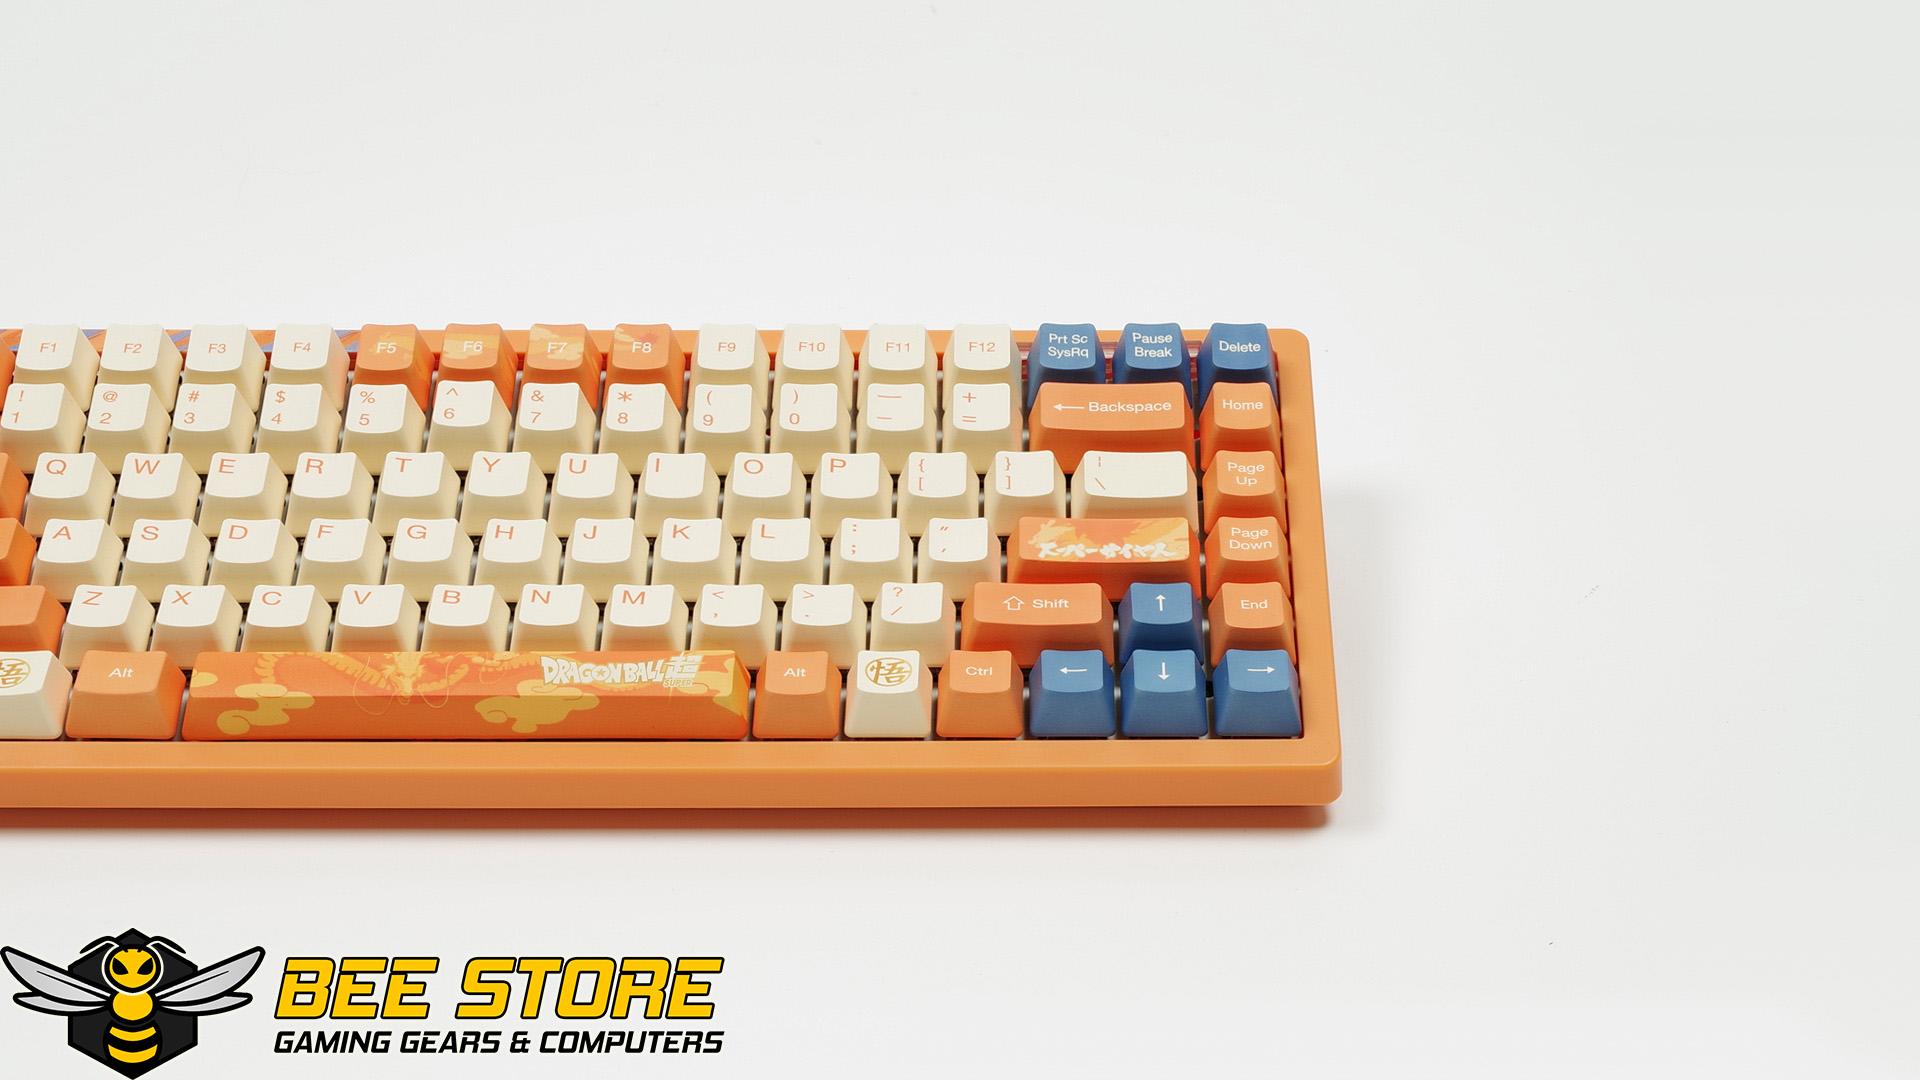 akko-3084-acg84-goku-beegaming-03